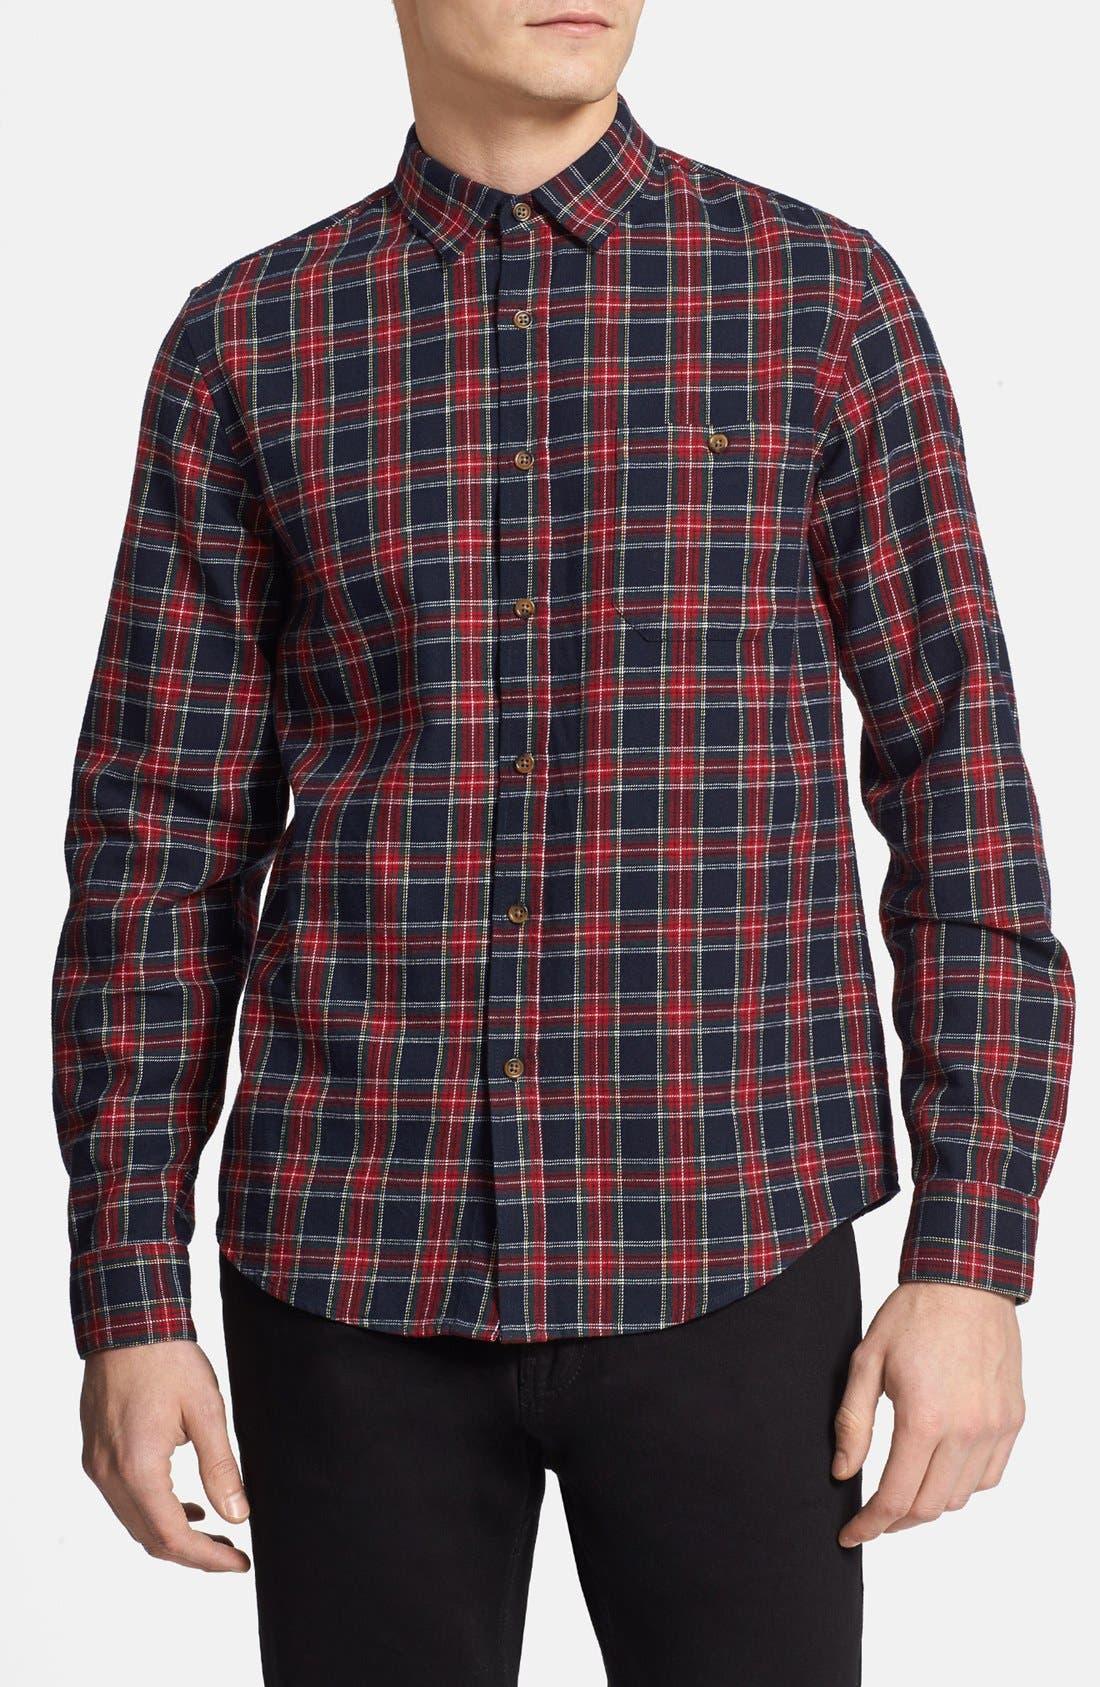 Alternate Image 1 Selected - Topman Classic Fit Tartan Flannel Shirt